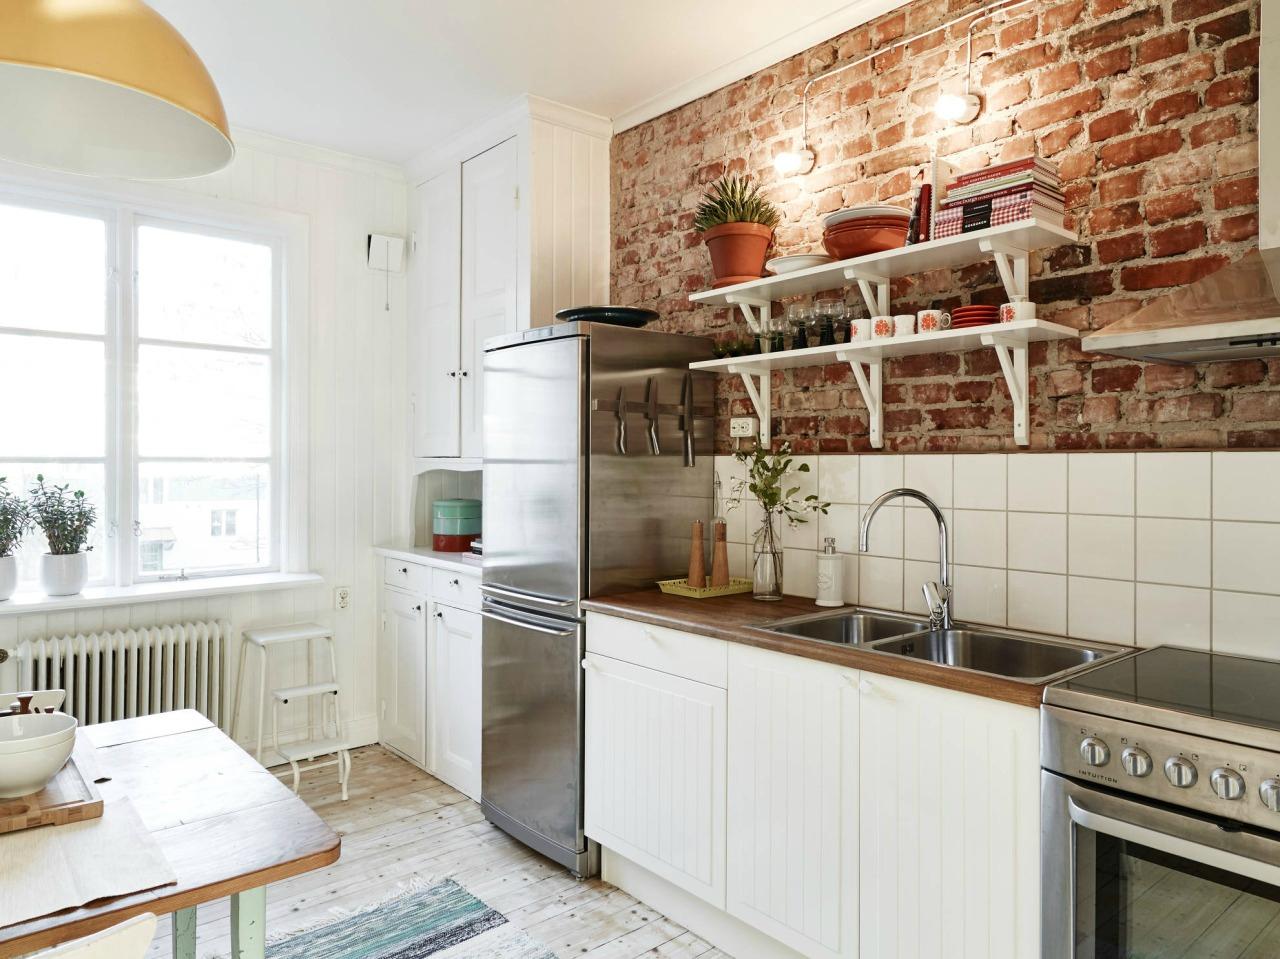 Кухня под кирпич в скандинавском стиле